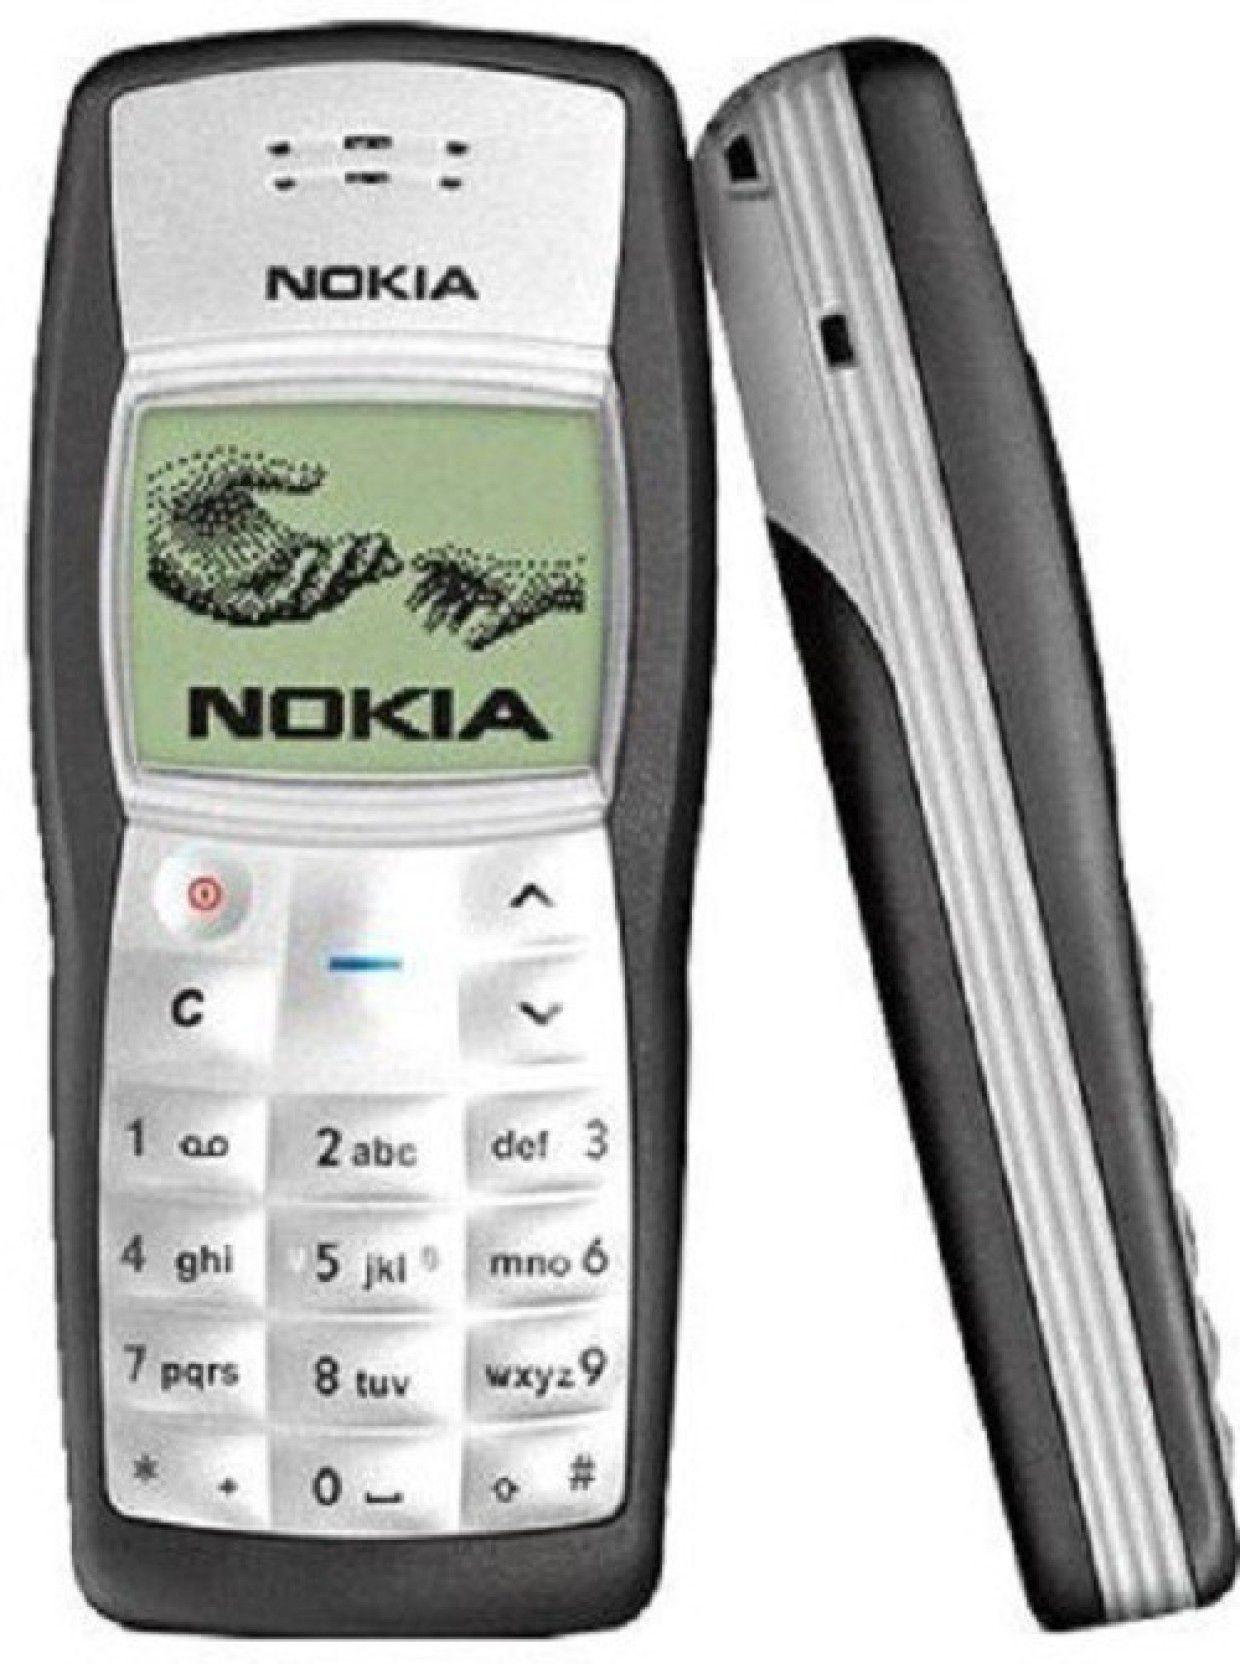 Camolinz Nokia 1100 Refurbished Black Camolinz Nokia 1100 Refurbished Black